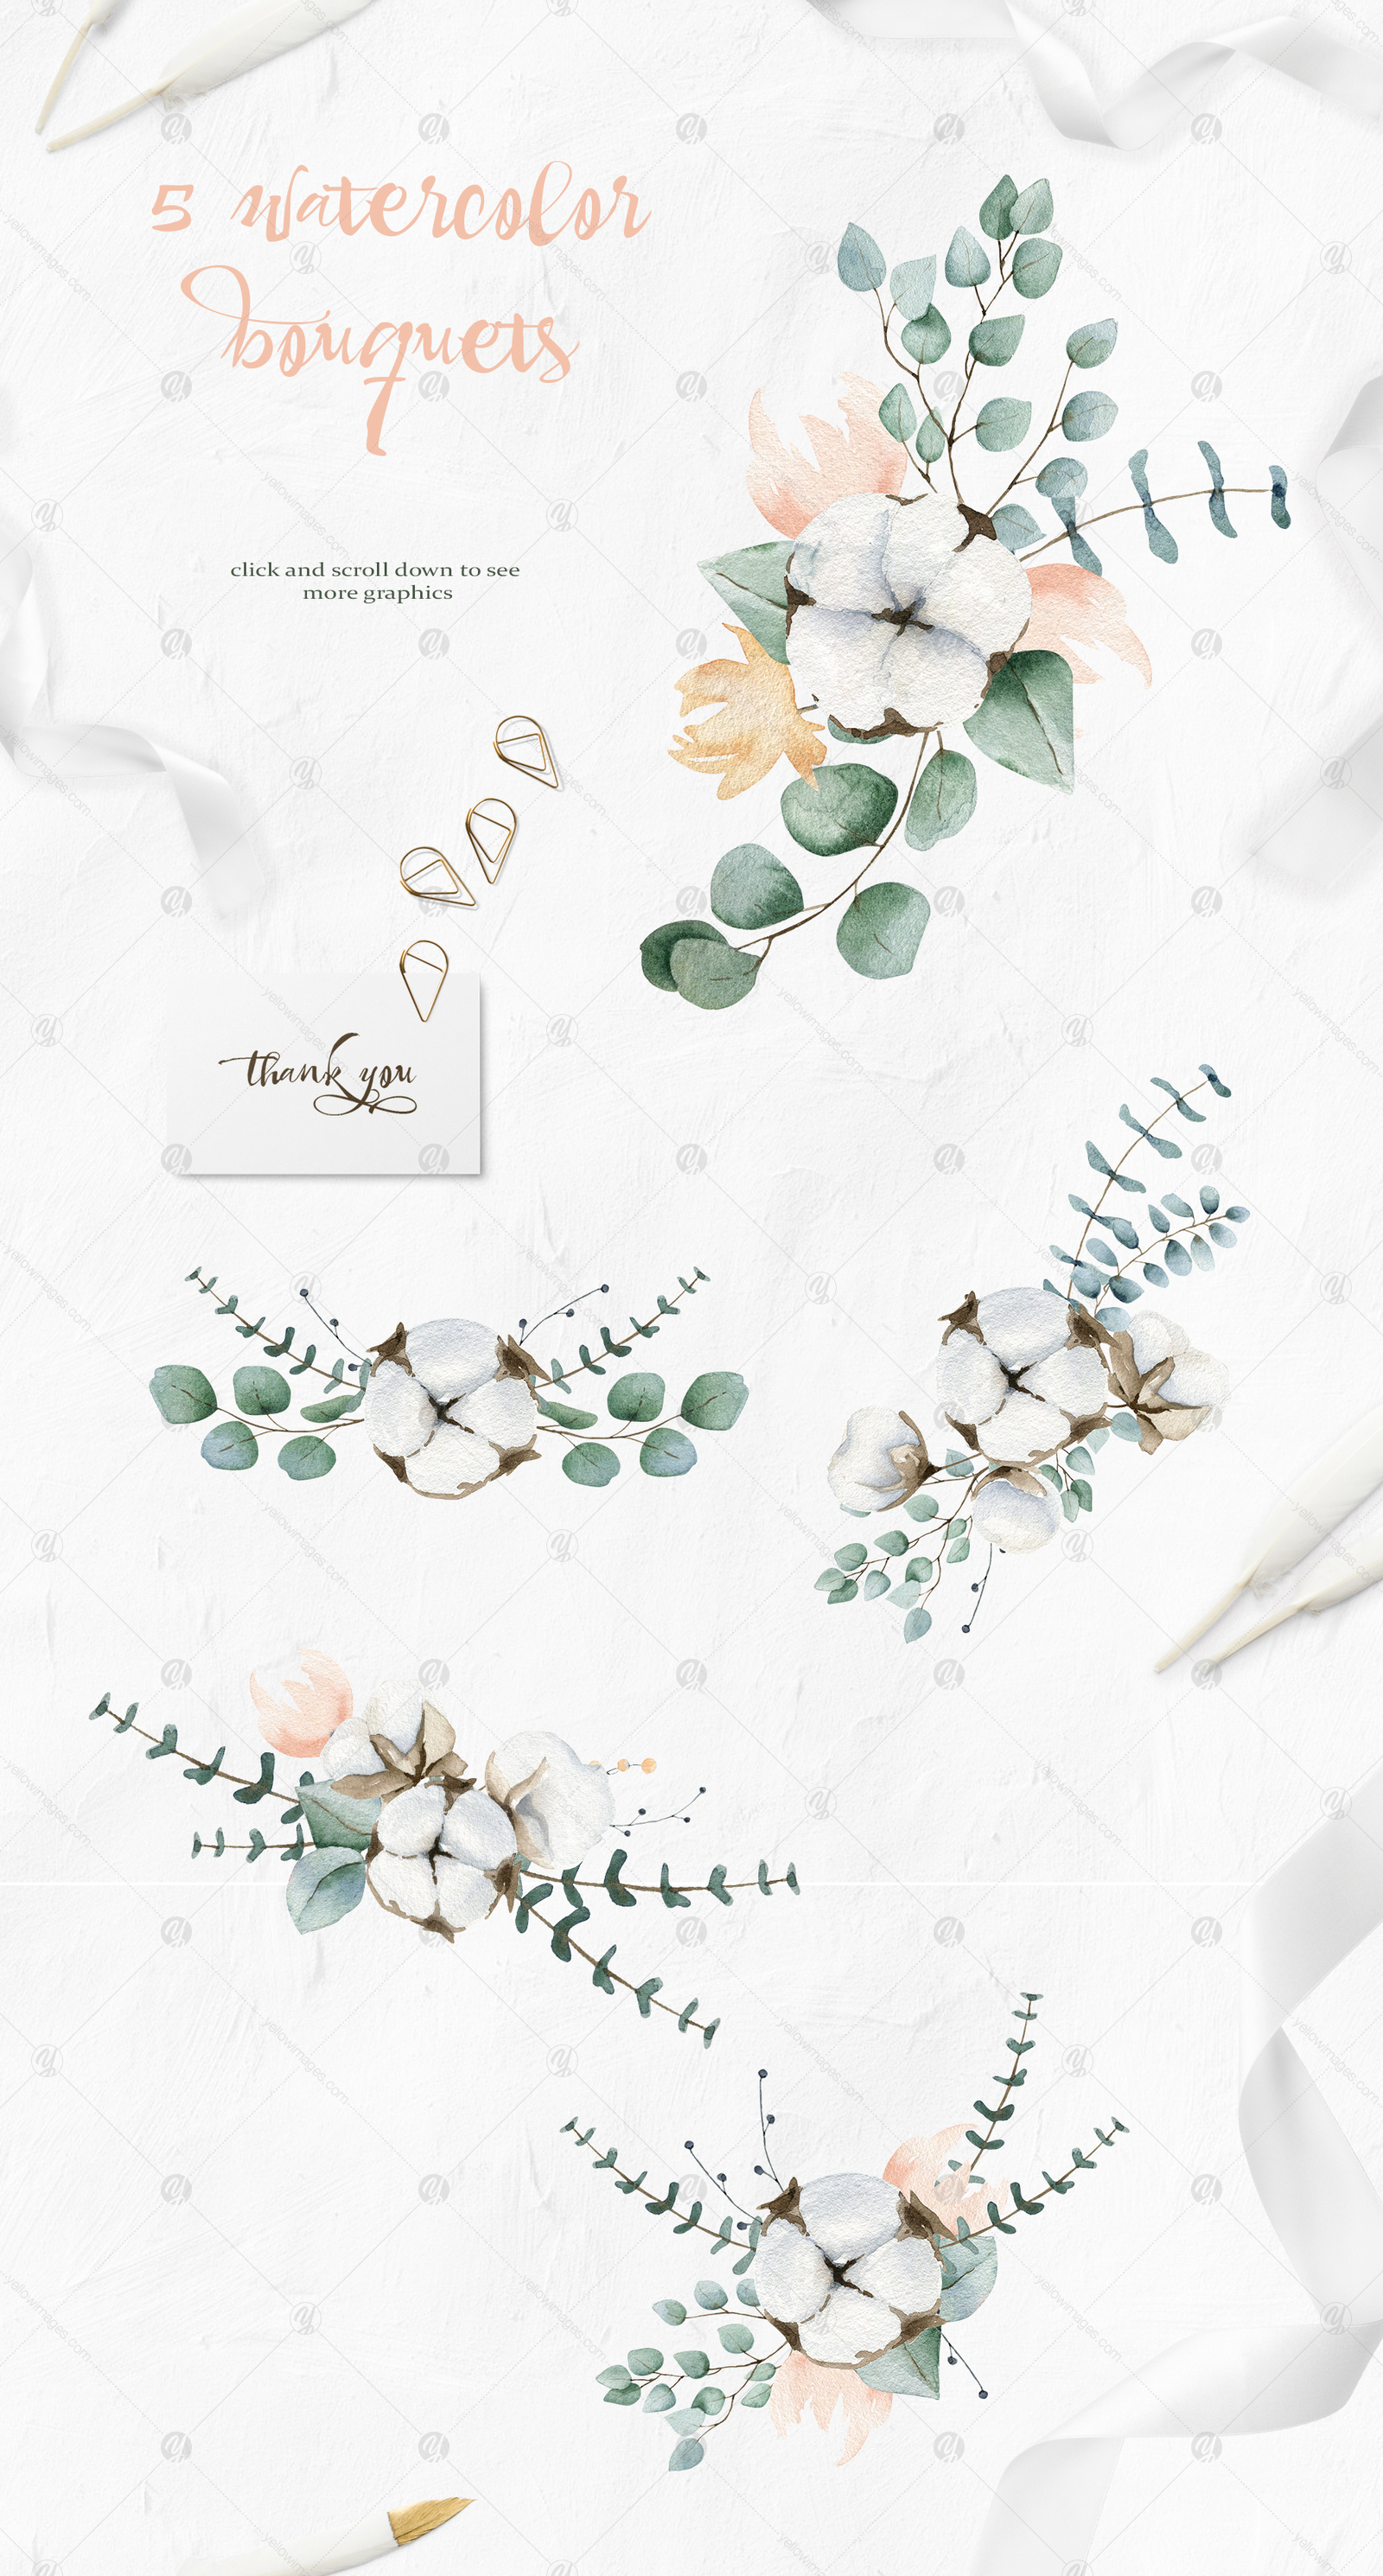 Cotton and Eucalyptus watercolor clipart collection